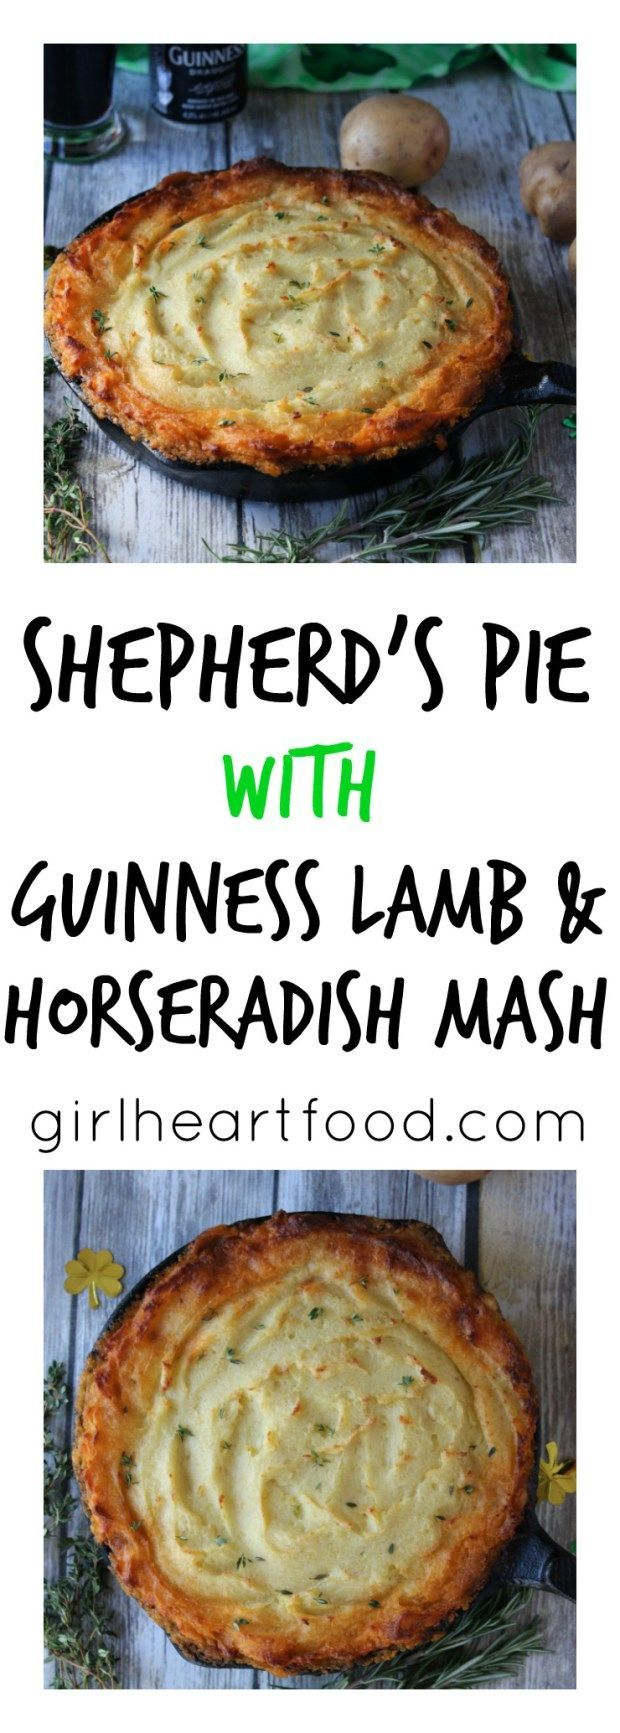 Sheperd's Pie {with Guinness Lamb and Horseradish Mash} - girlheartfood.com